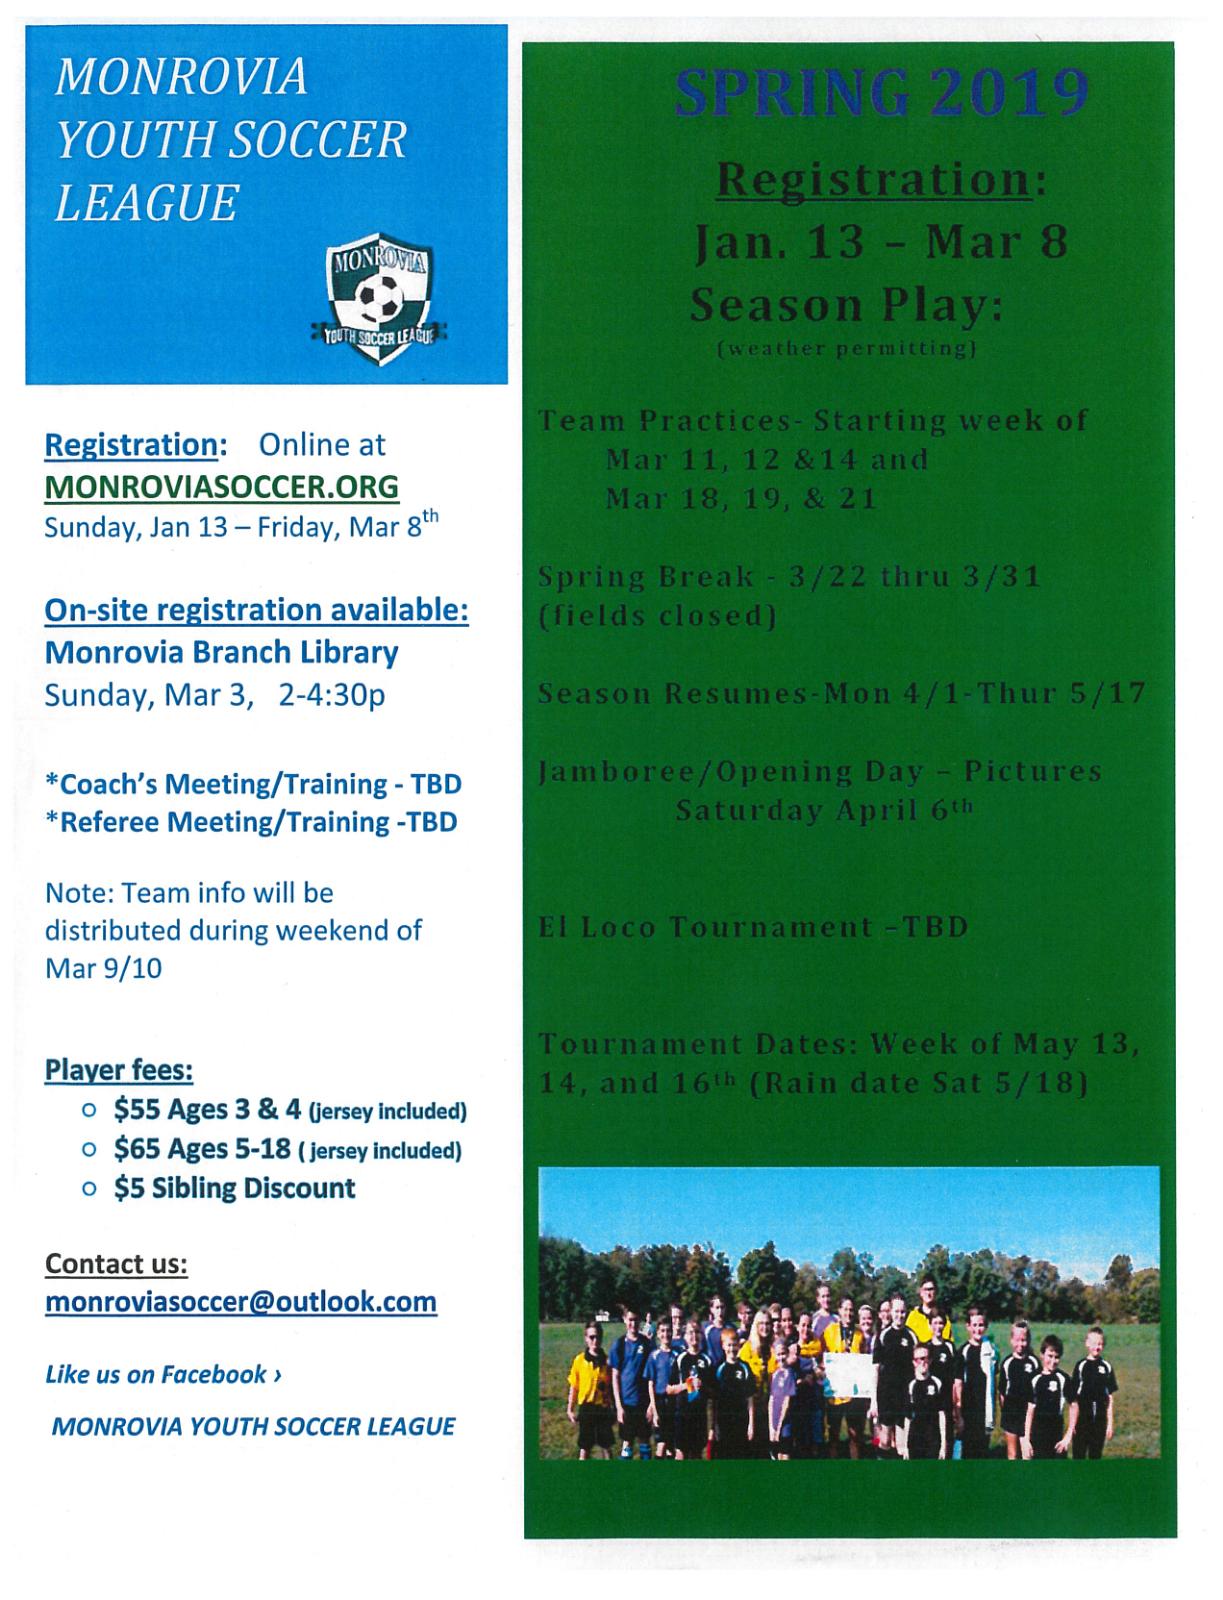 Monrovia Youth Soccer Registration